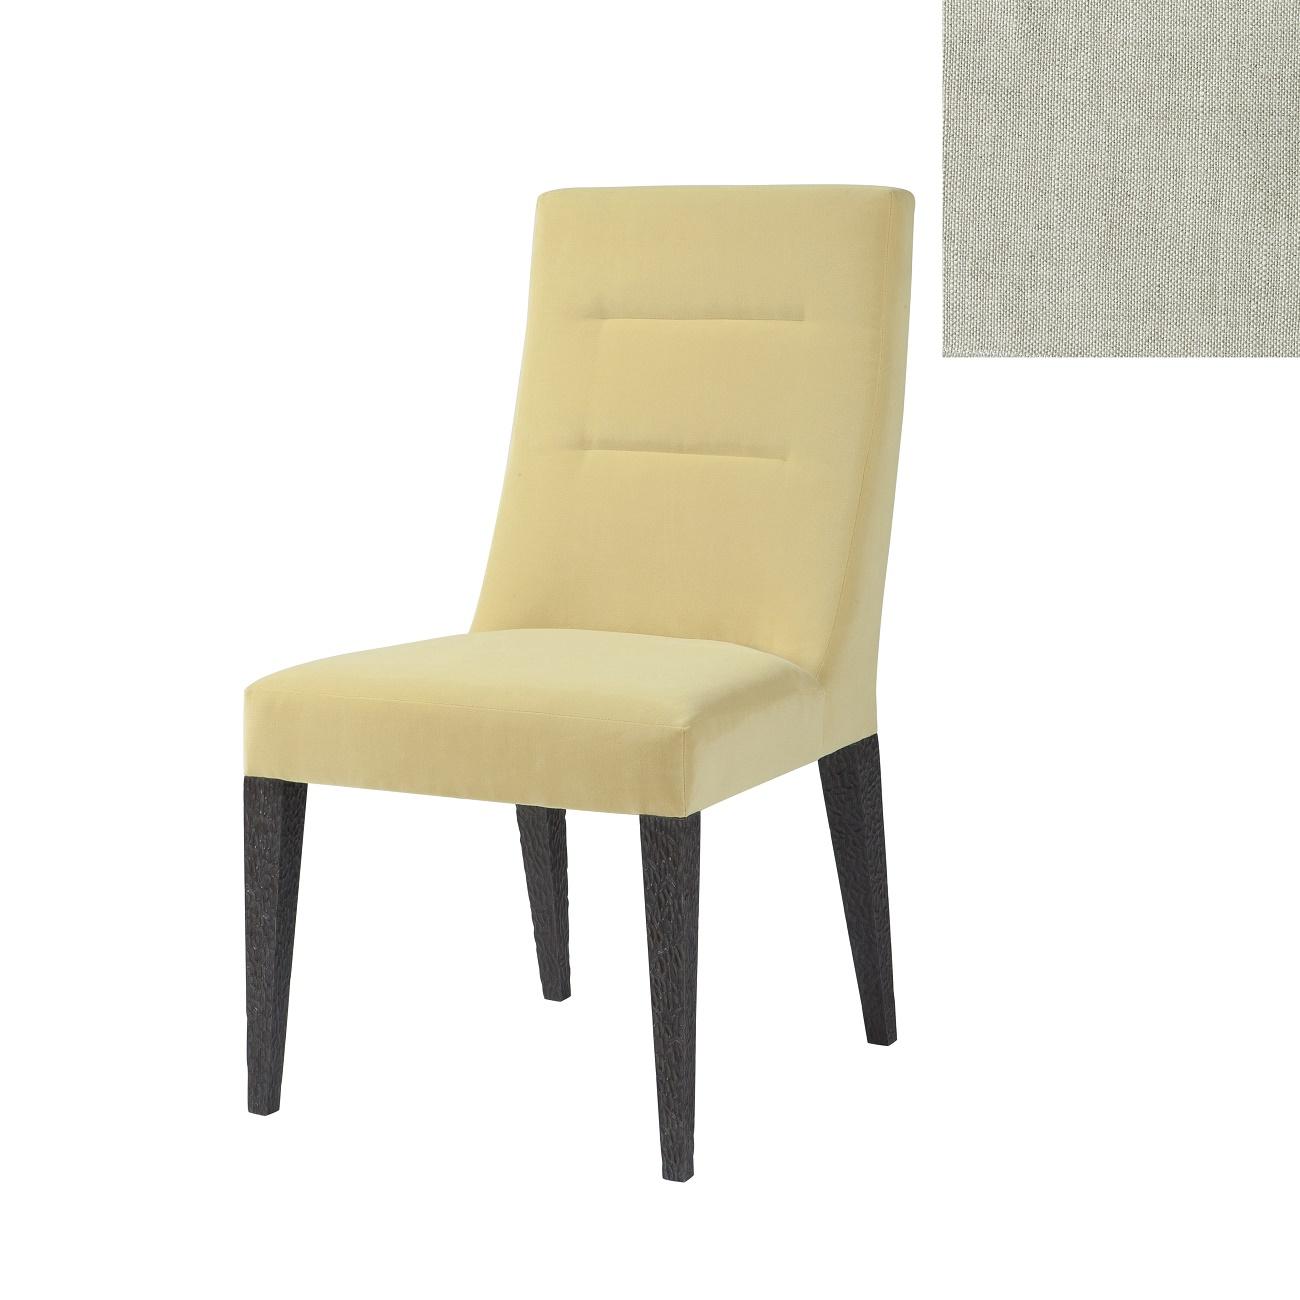 MB1003 1AQI Bradford Dining Chair Theodore Alexander